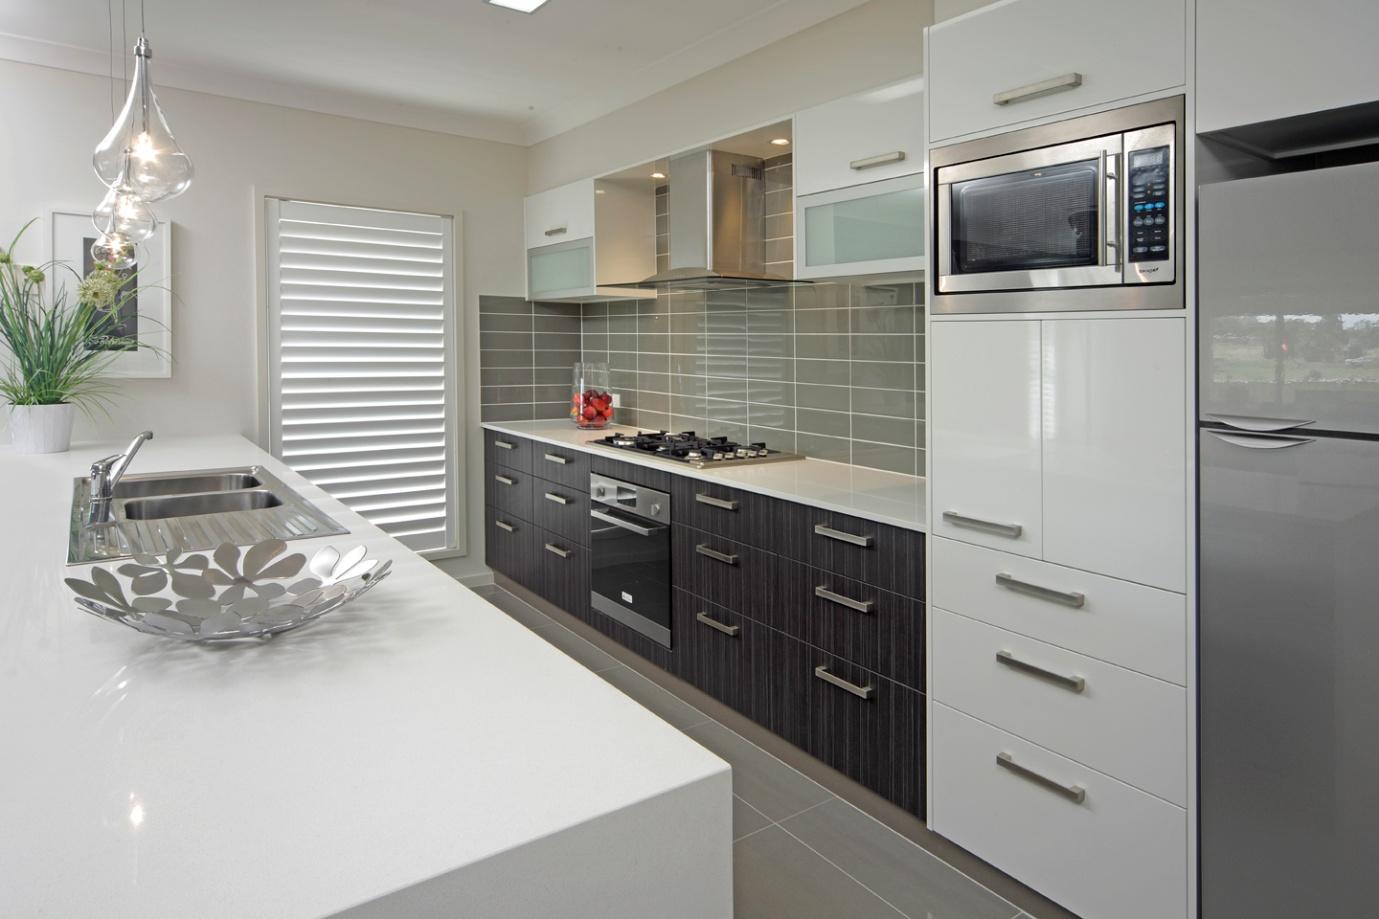 Exquisite Sleek Kitchen Designs Of Kitchens Interior Pic Of ...